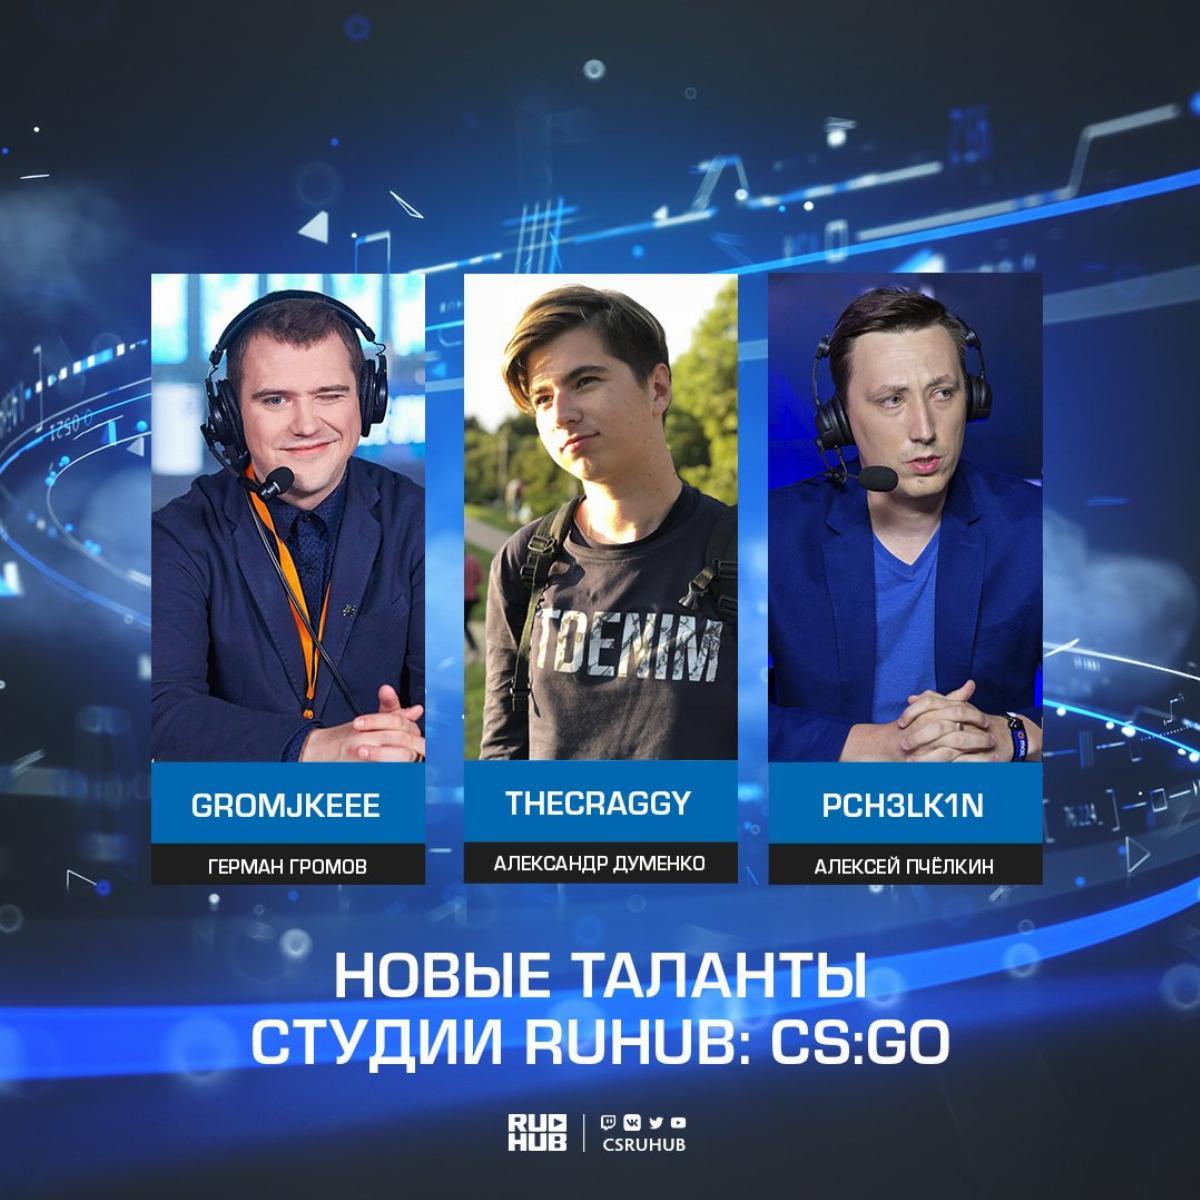 Gromjkeee, Герман Громов, комментатор CS:GO, комментатор RuHub